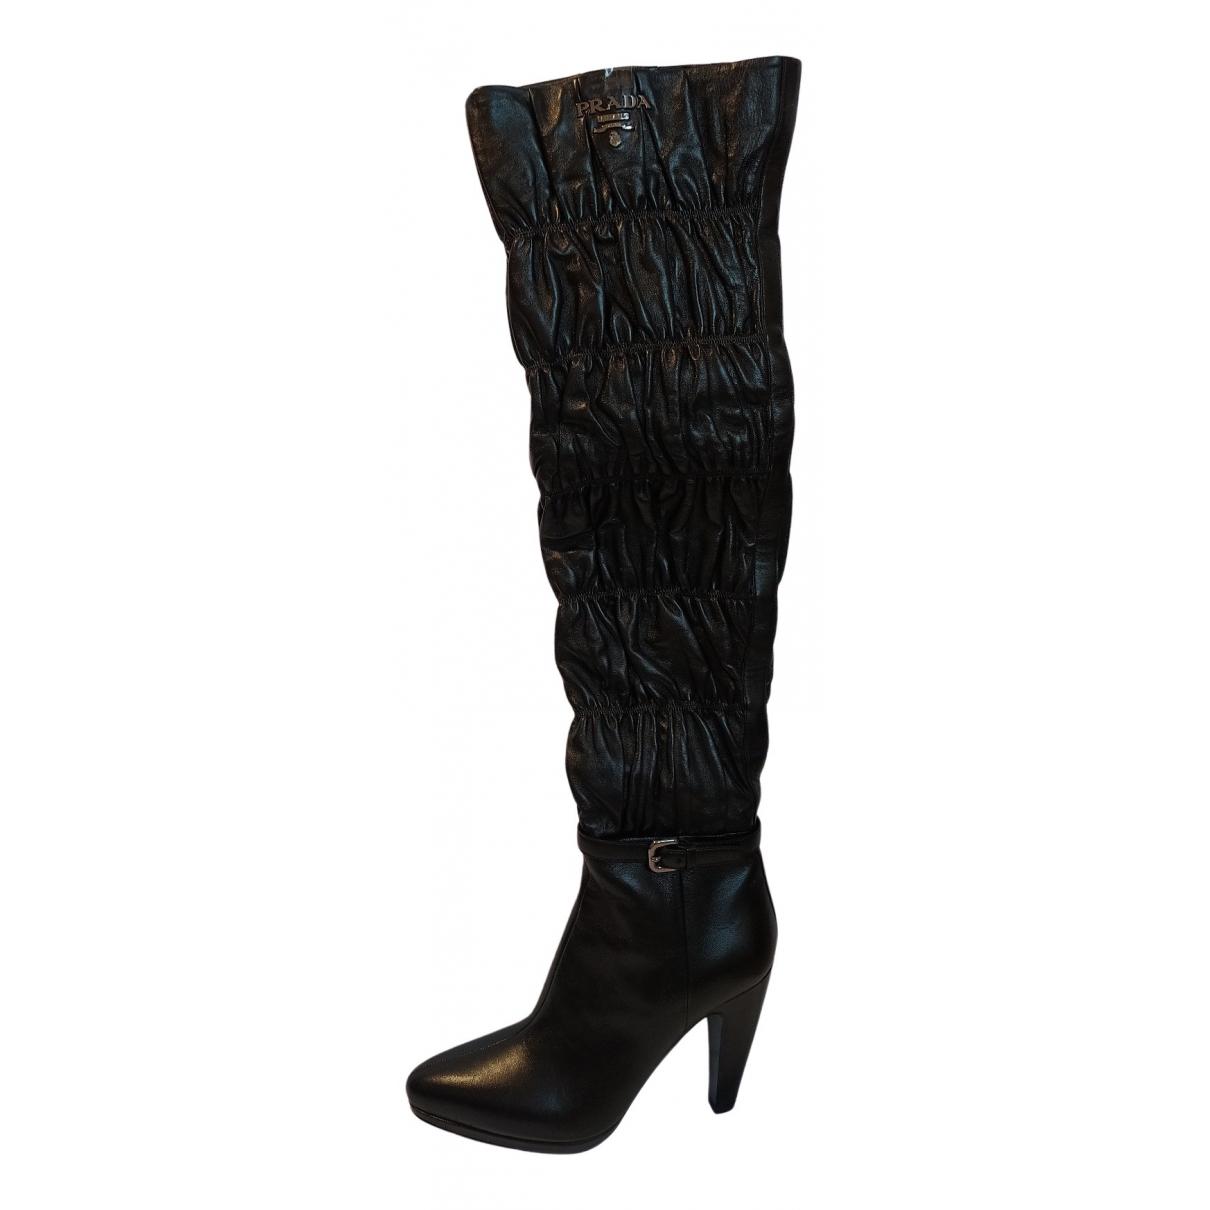 Prada N Black Leather Boots for Women 37 EU